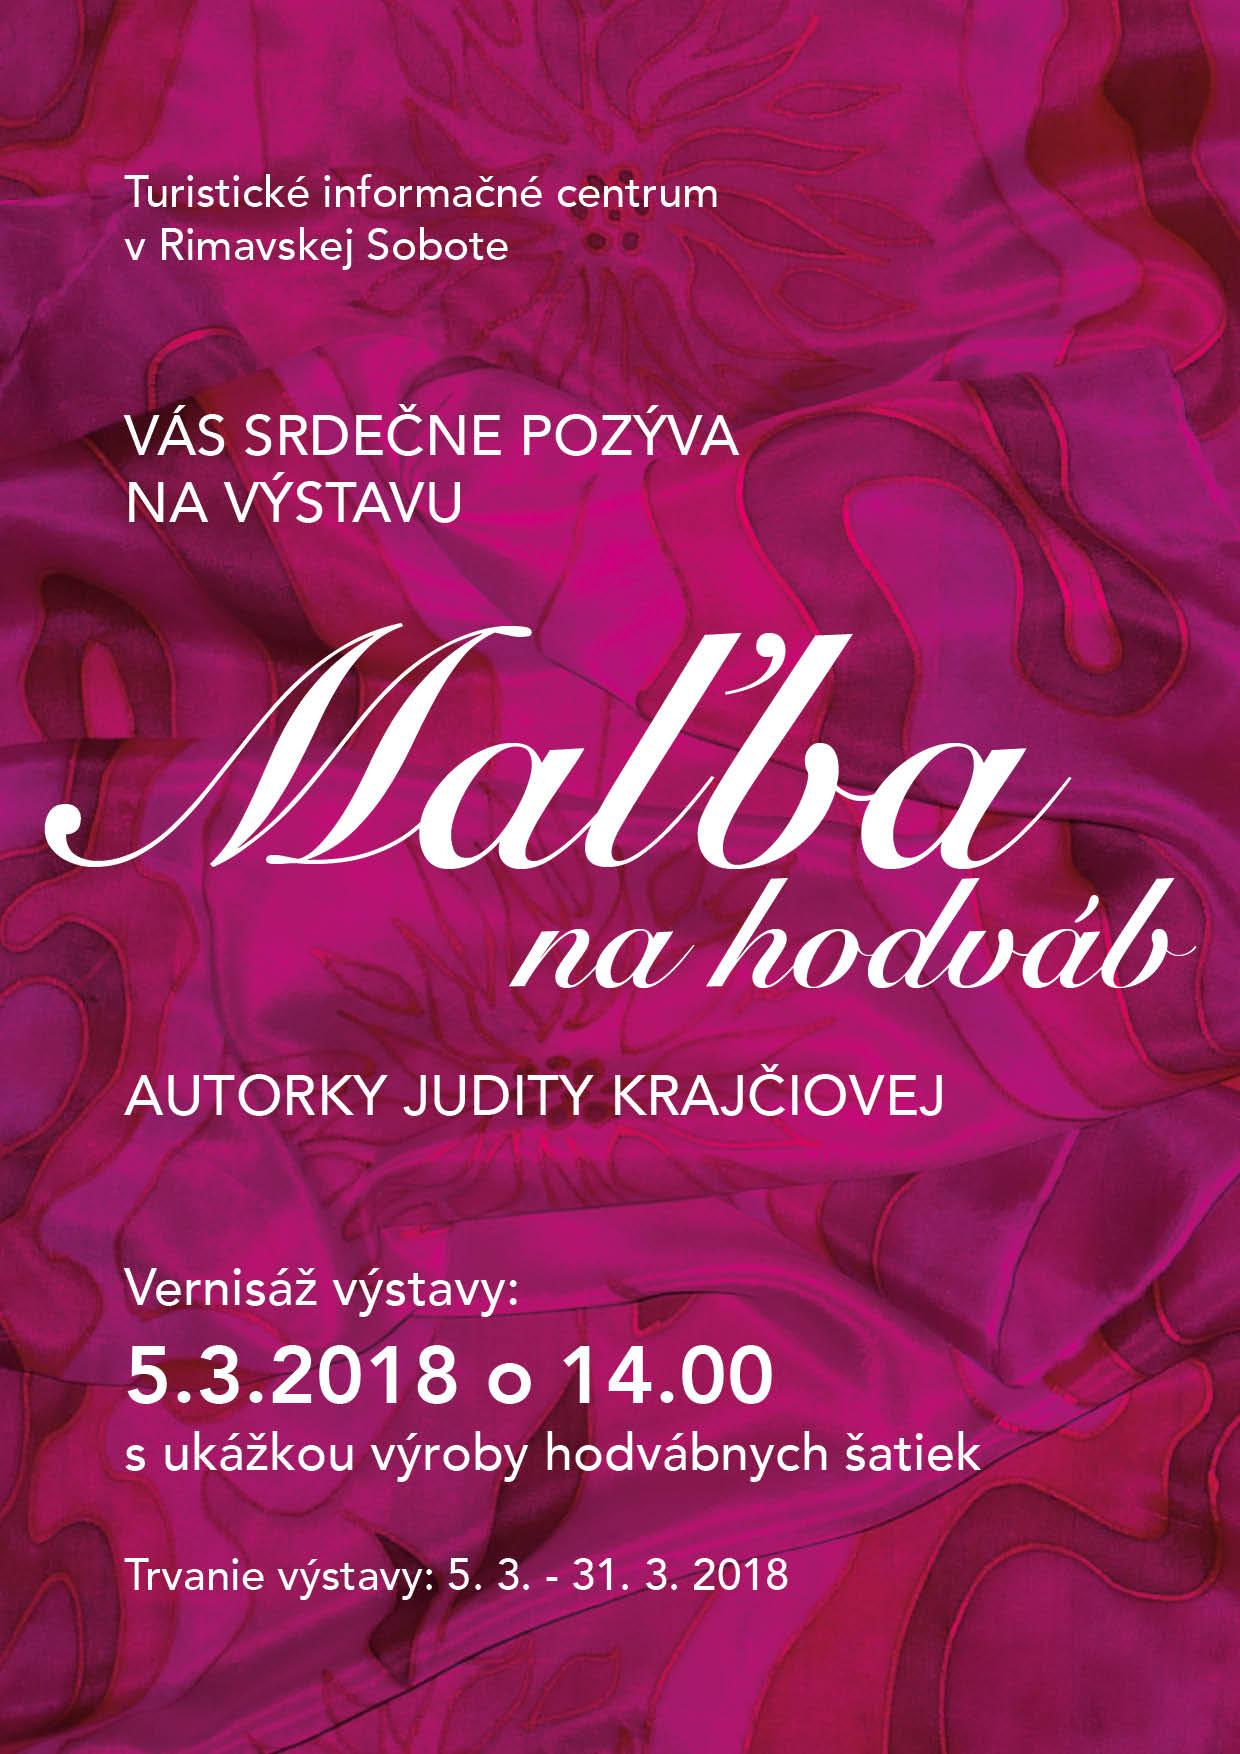 Maľba na hodváb @ Rimavská Sobota | Banskobystrický kraj | Slovensko